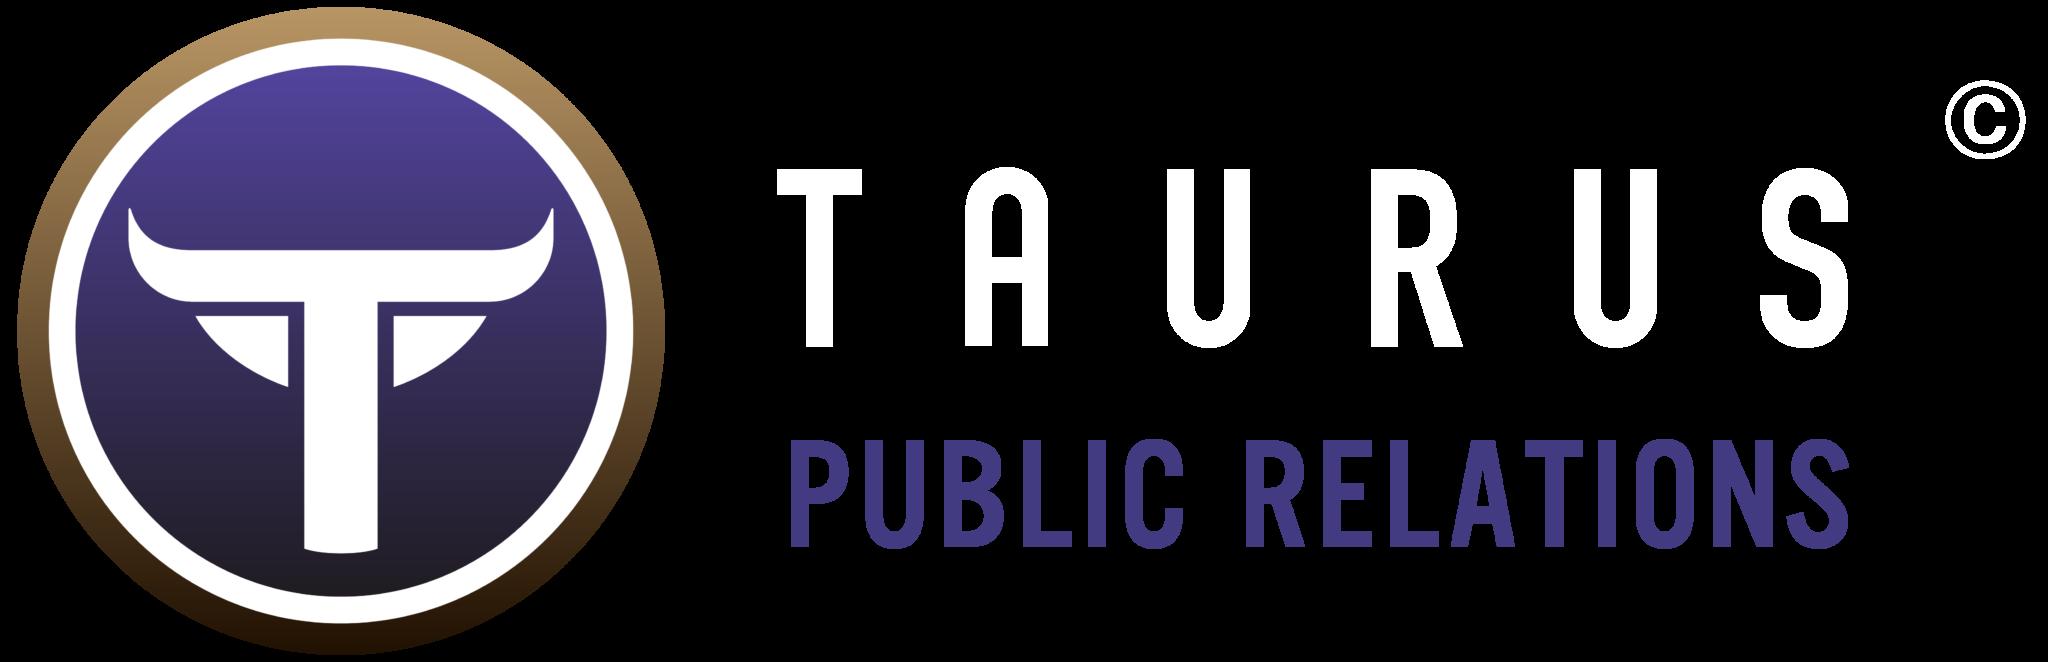 TaurusPublicRelations Horiztonal White